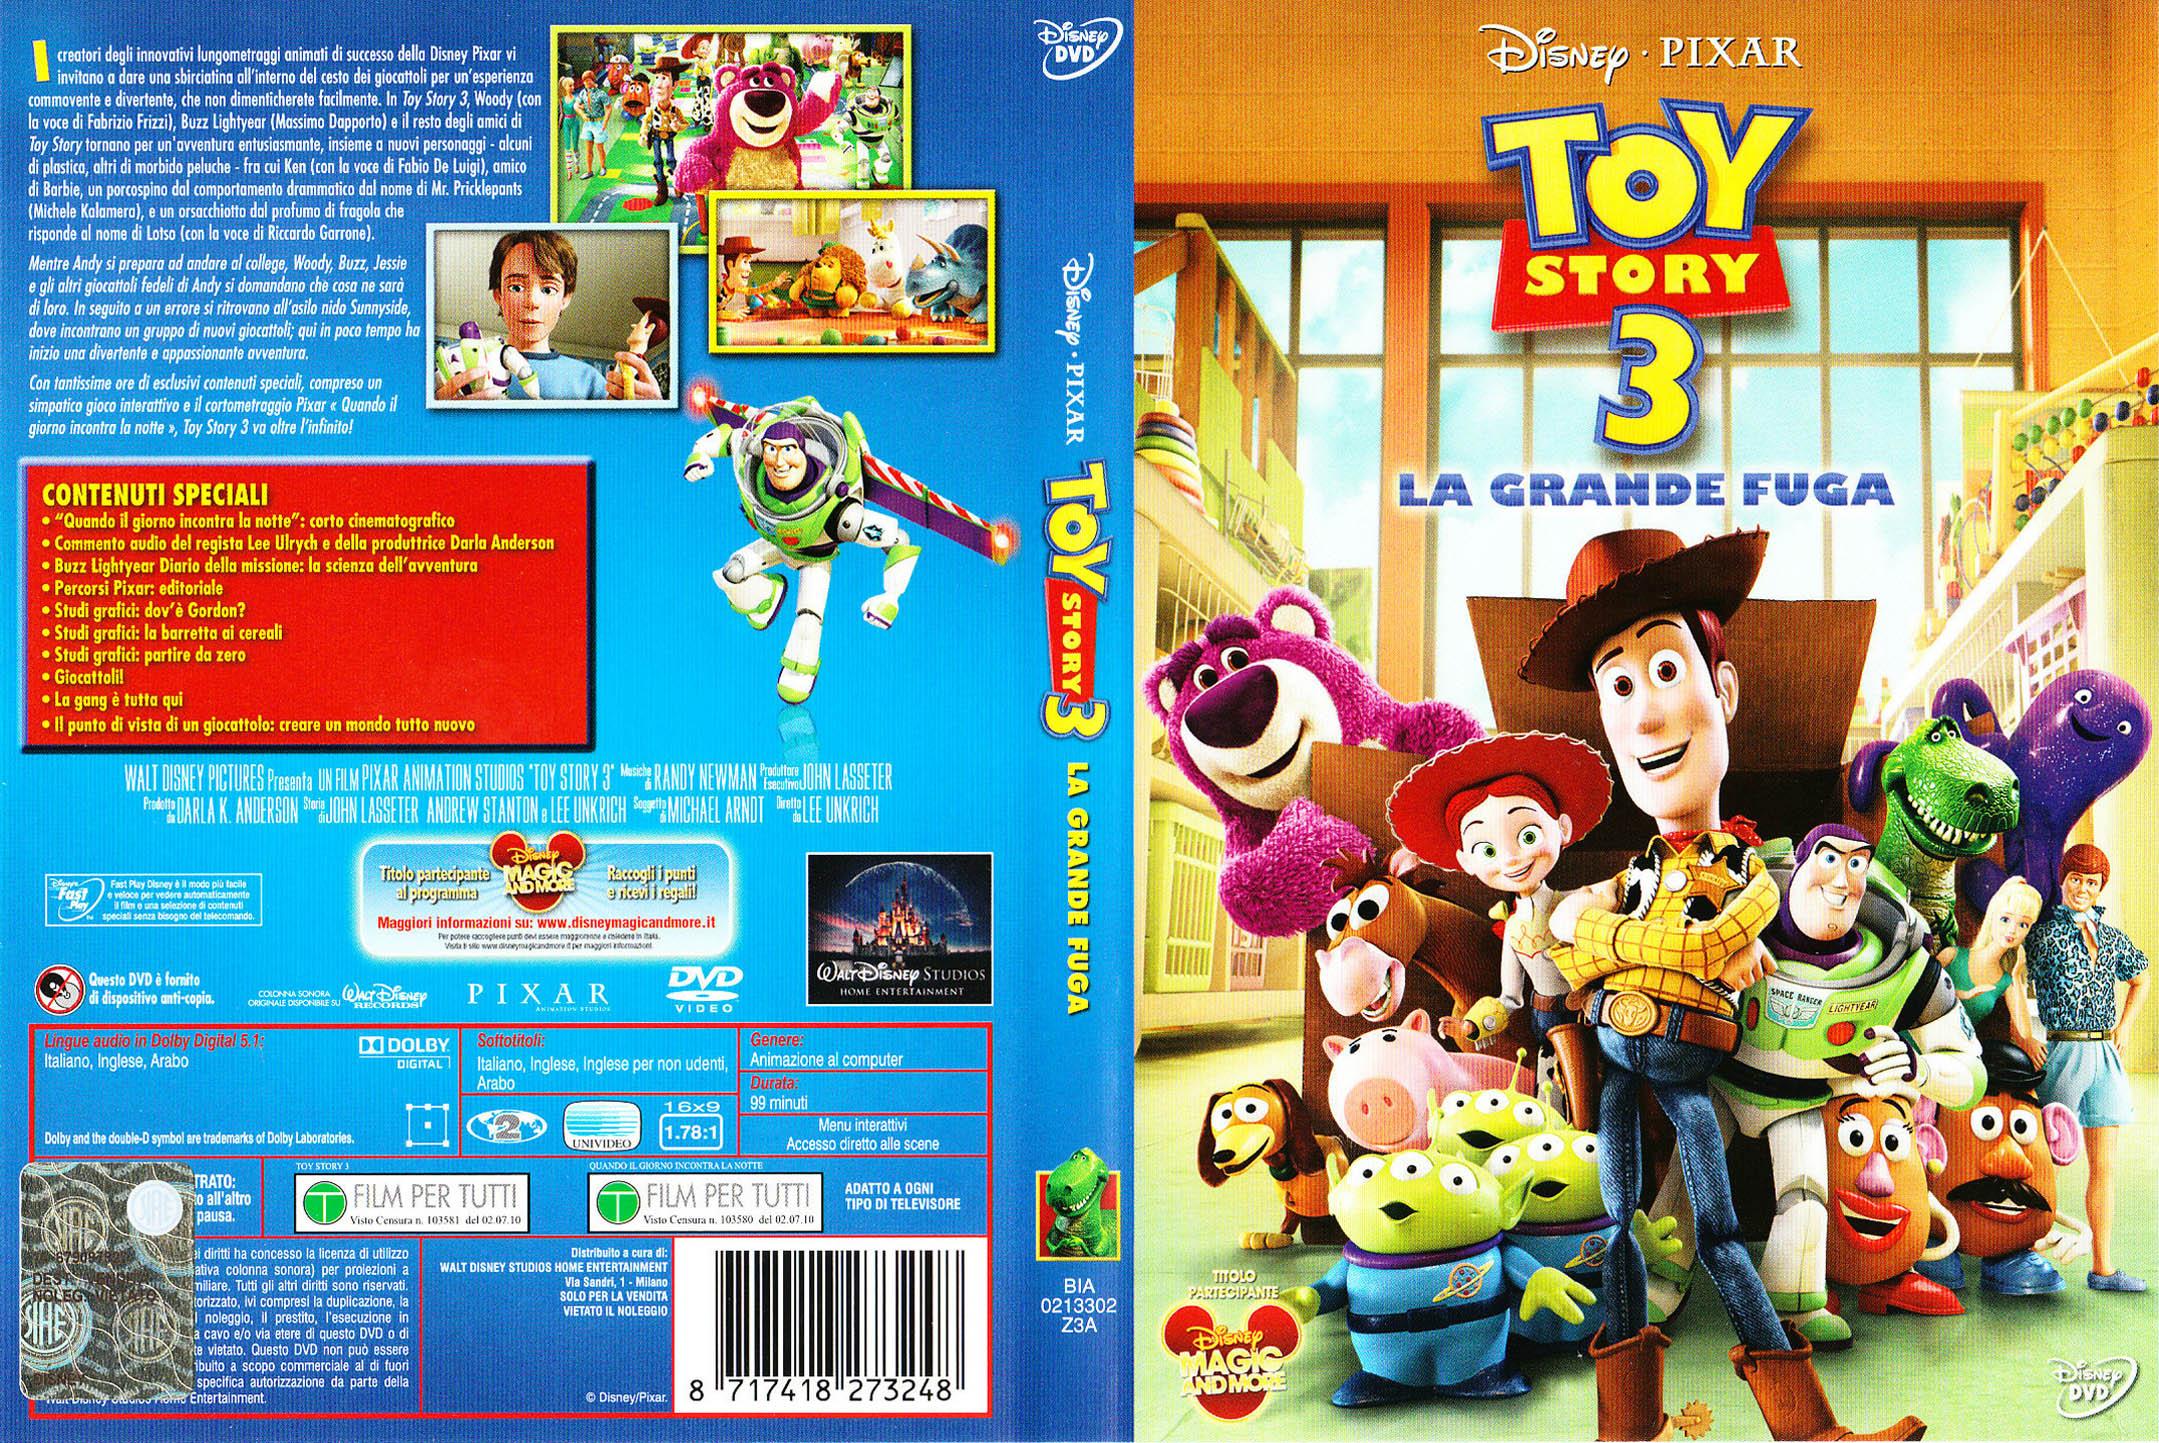 Disney Pixar Toy Story 4 vero Chiacchierone-REX